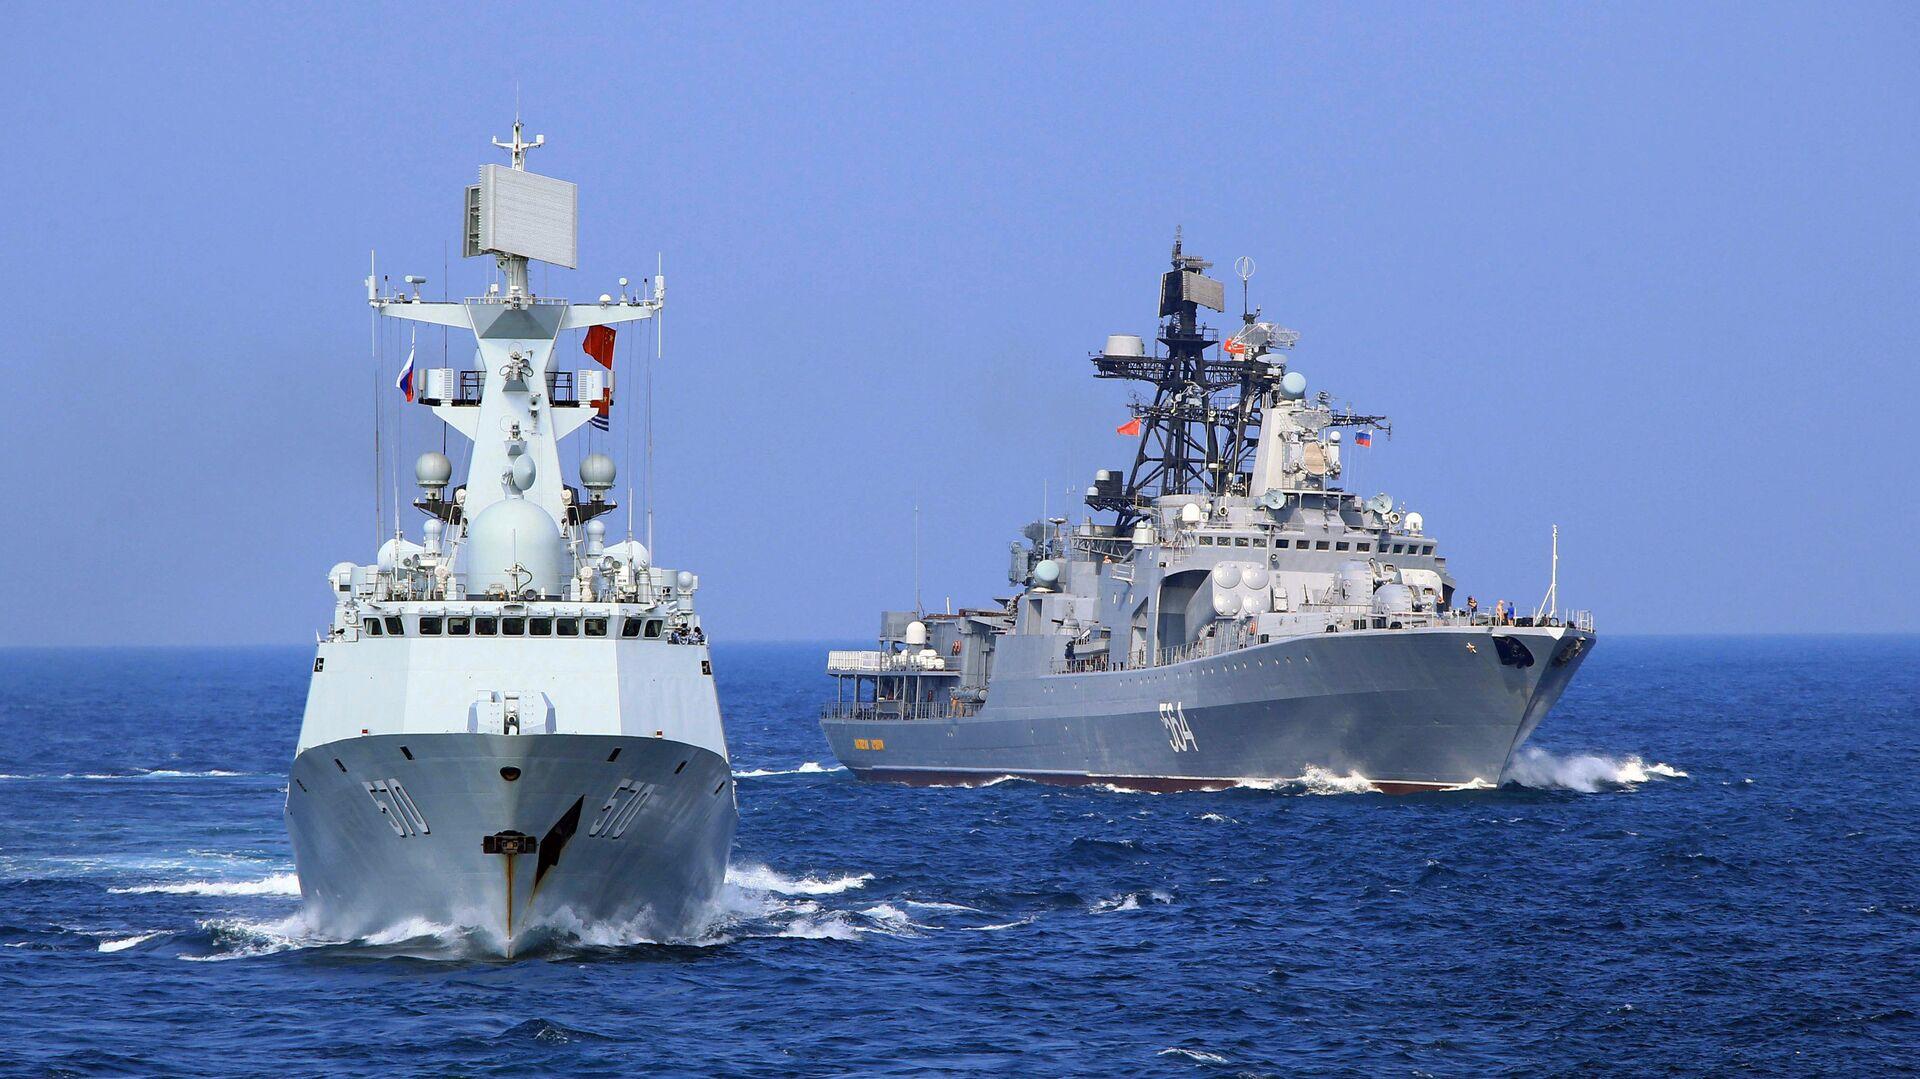 Maniobras navales de China y Rusia (archivo) - Sputnik Mundo, 1920, 01.03.2021